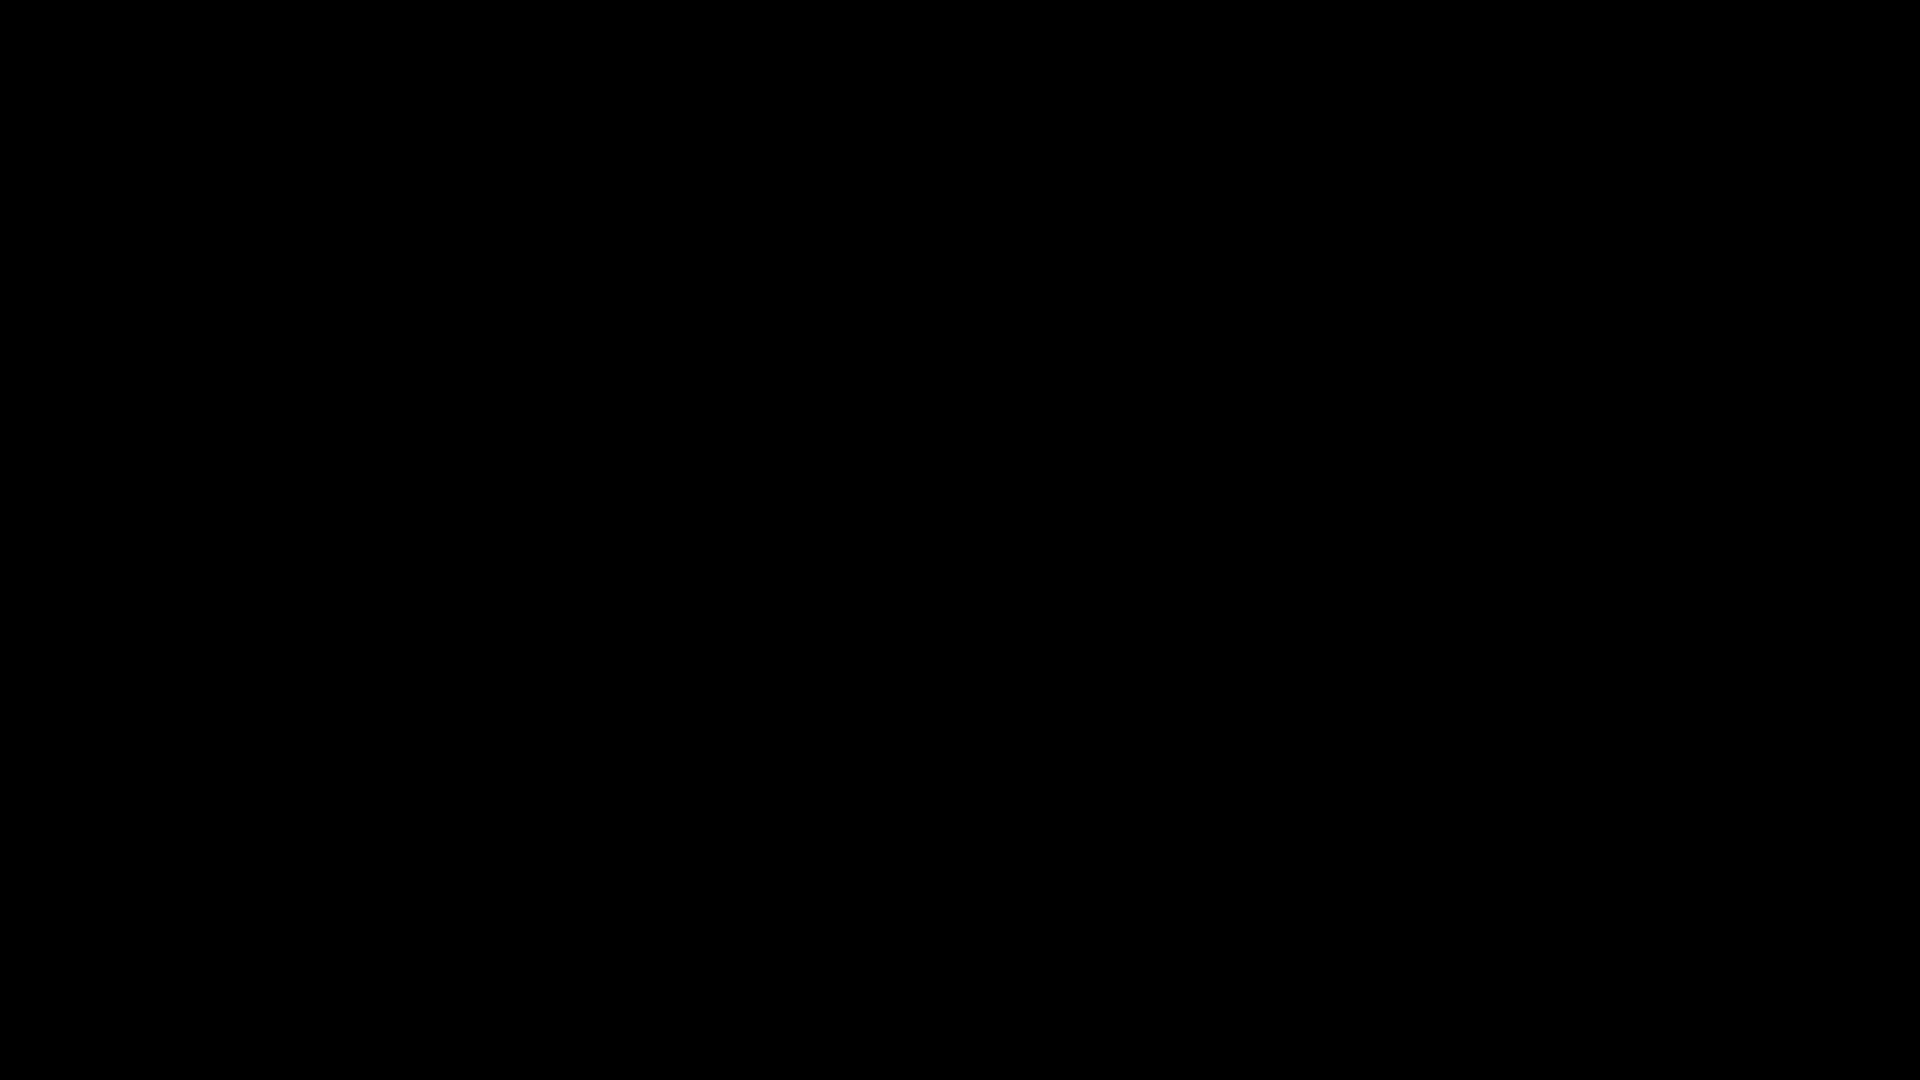 Nokian-Tyres-logo-2560x1440